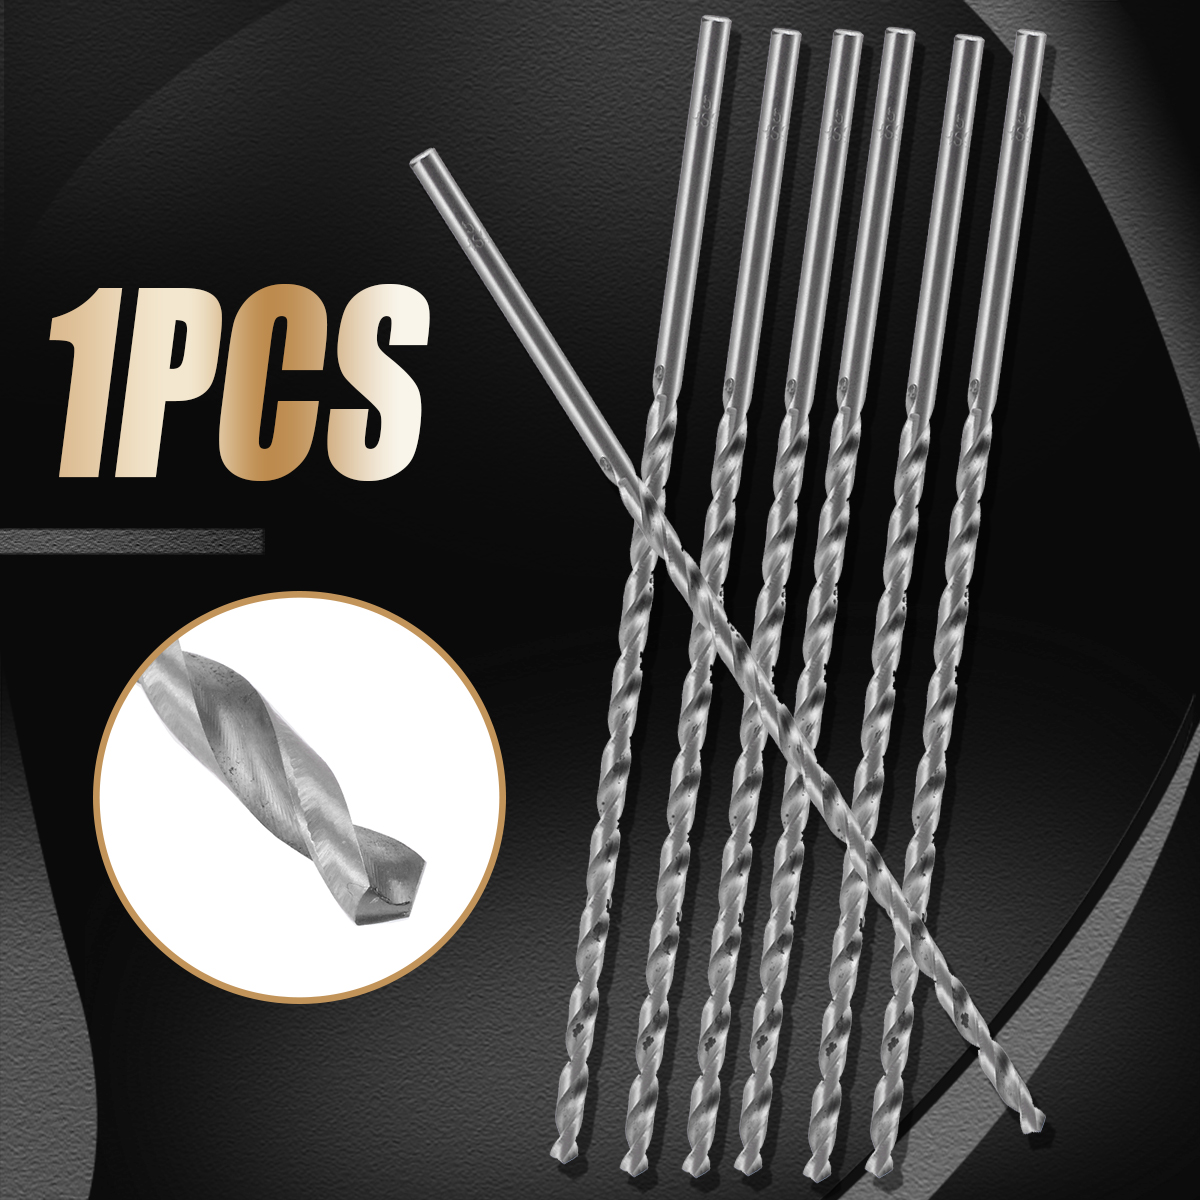 12 PCS Number #43 Heavy Duty Jobber Drill Bit M2 High Speed Steel